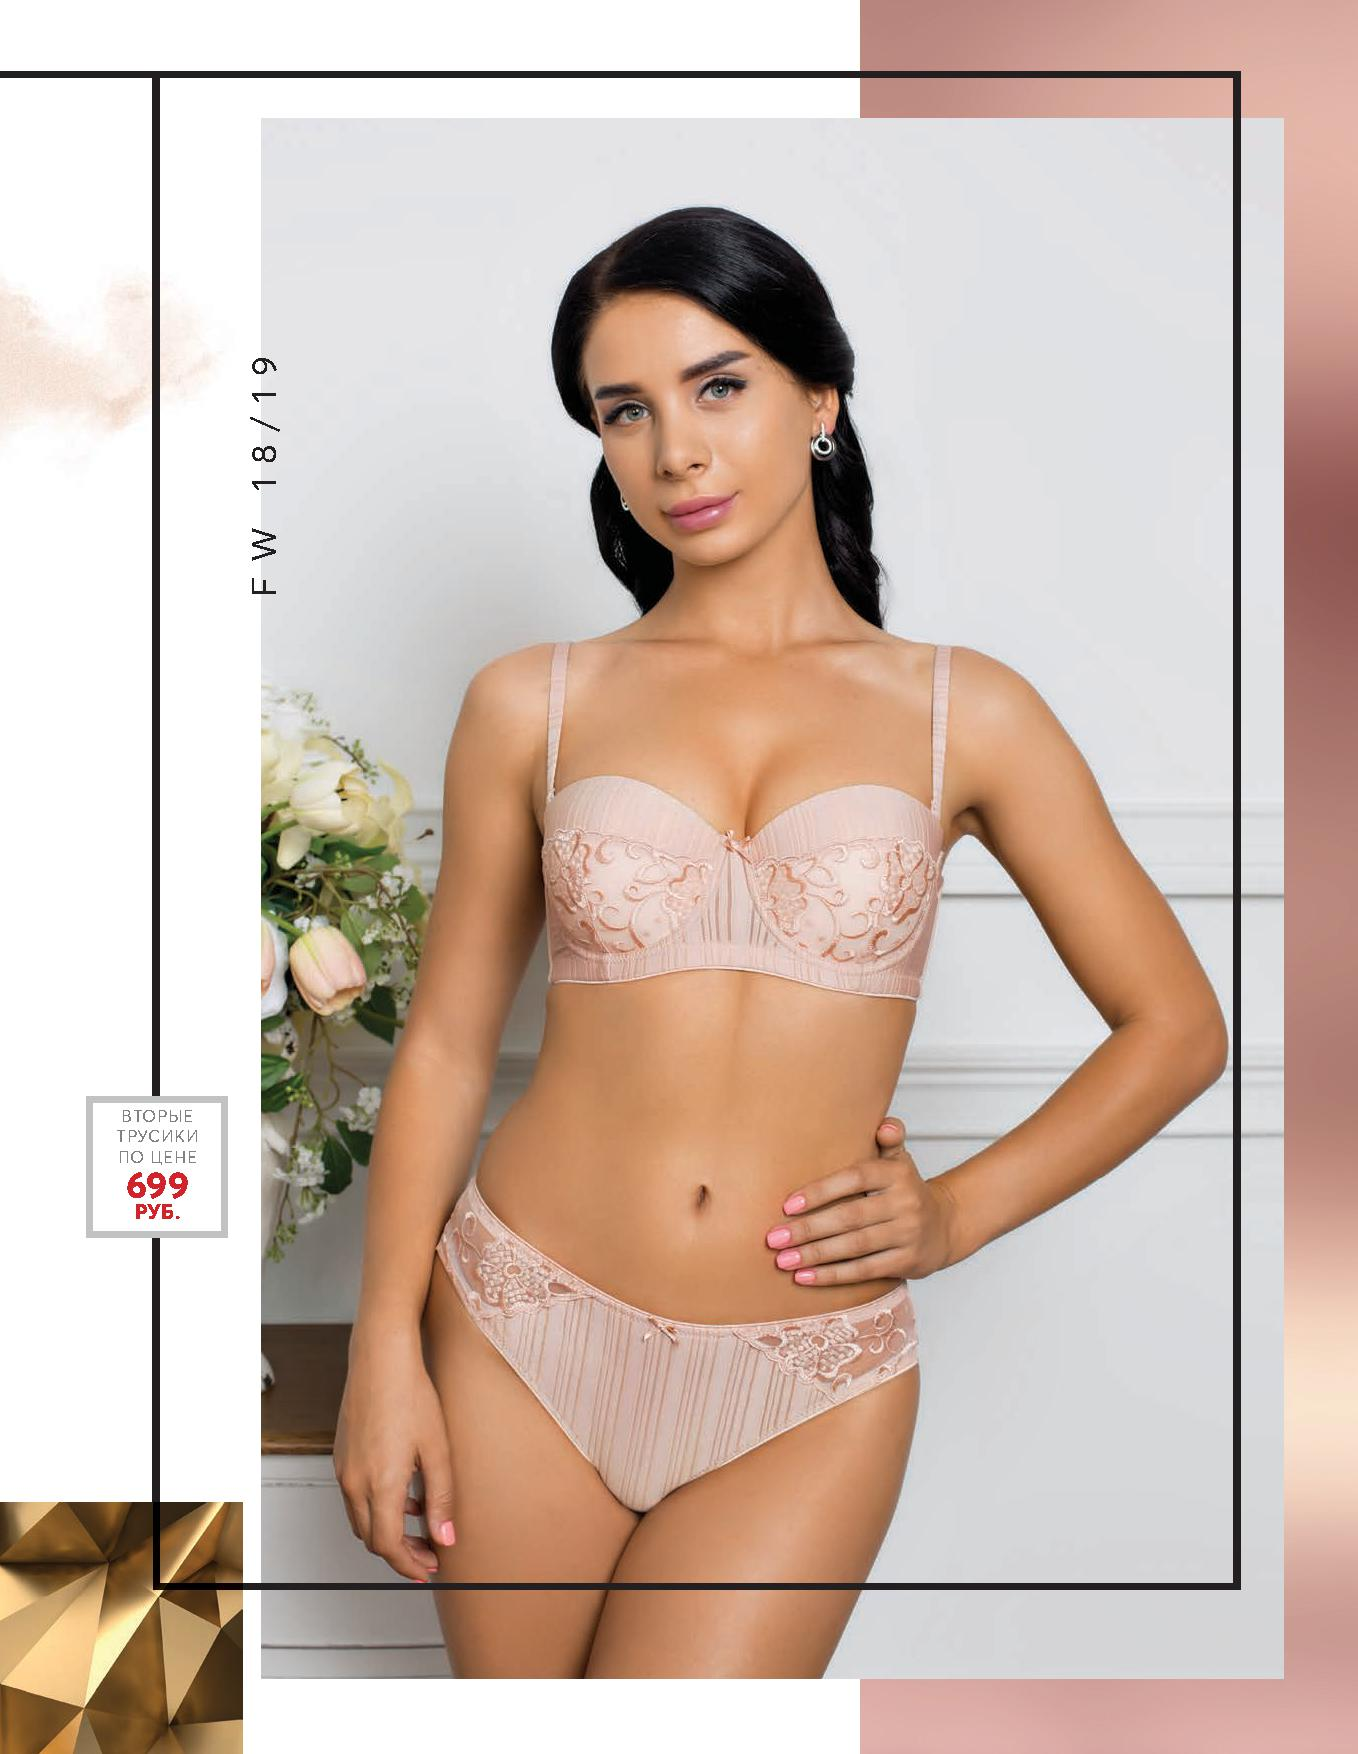 картинка бюстгальтер трусики модель Amour каталог МонМио осень-зима 2018-2019